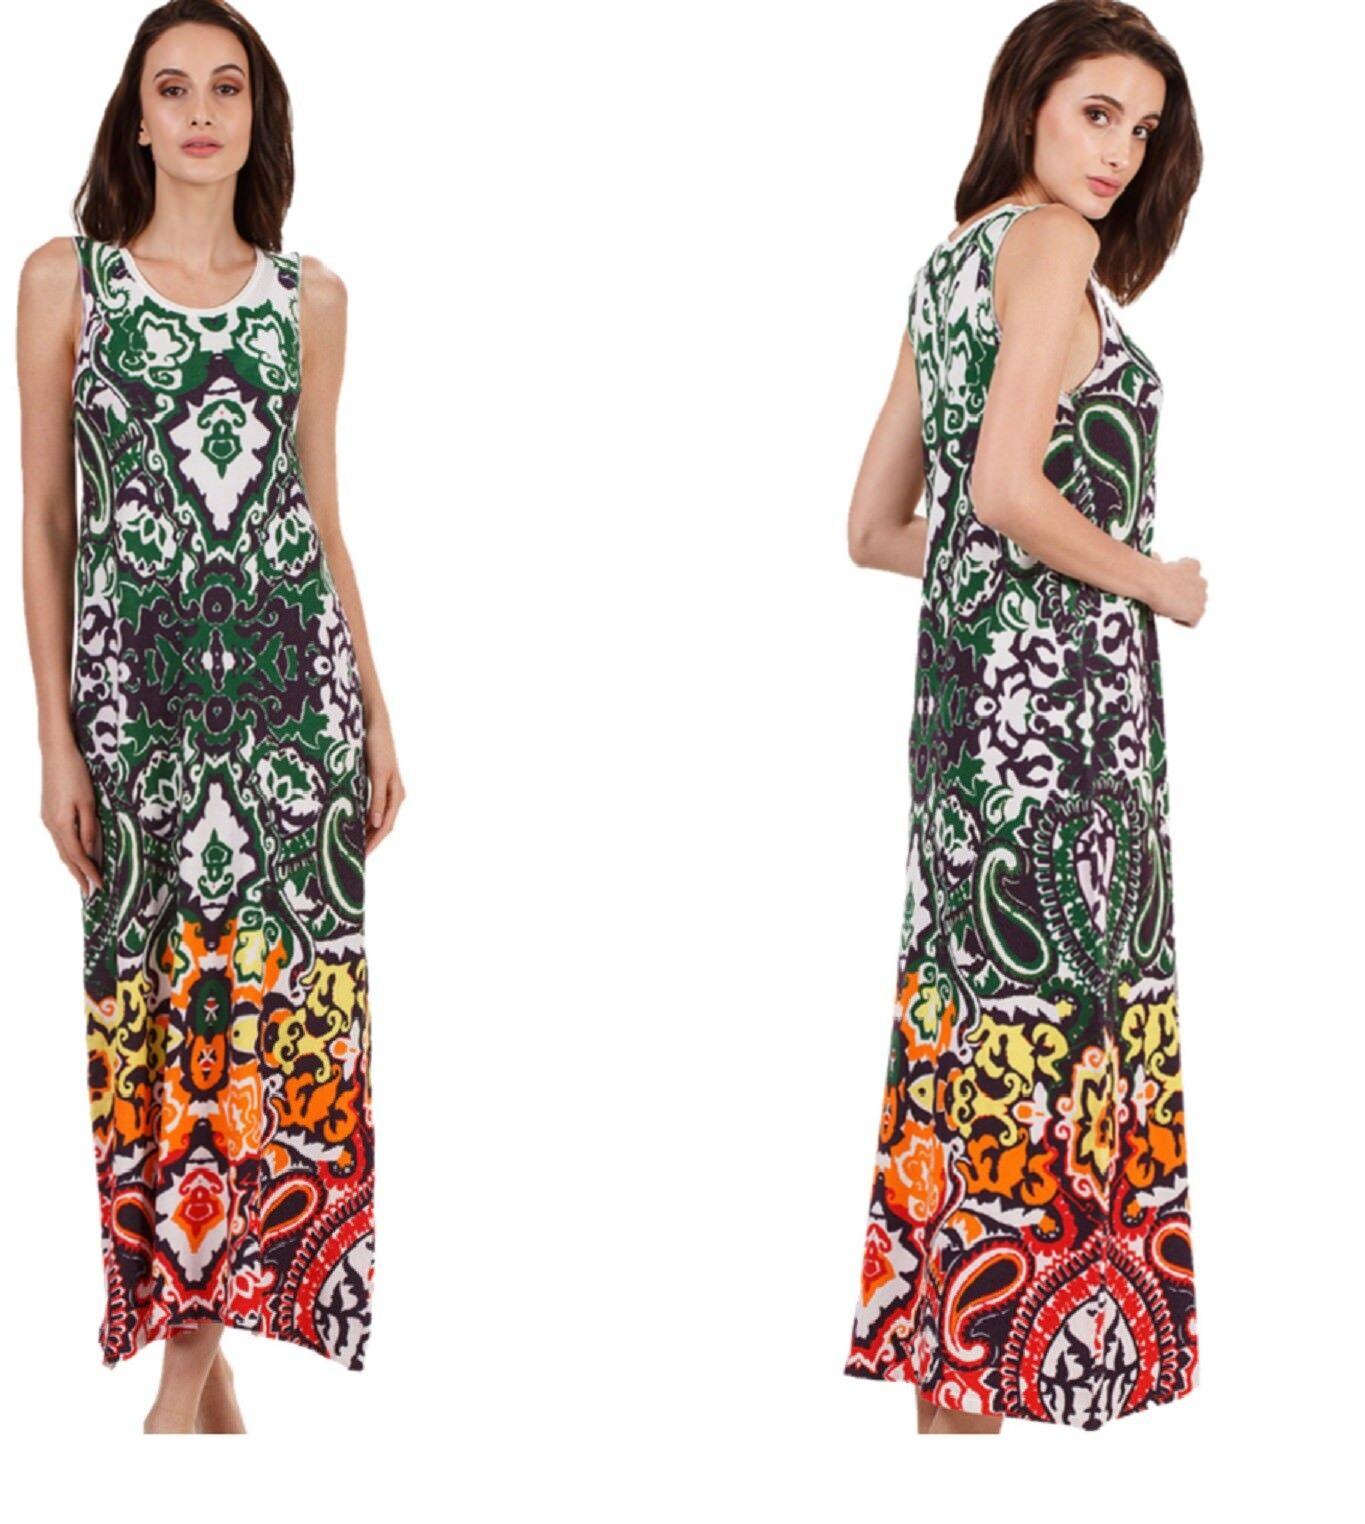 KOOI knitwear Stretch Print-Kleid dressmulticolor bunt DC Iv-KO 18011